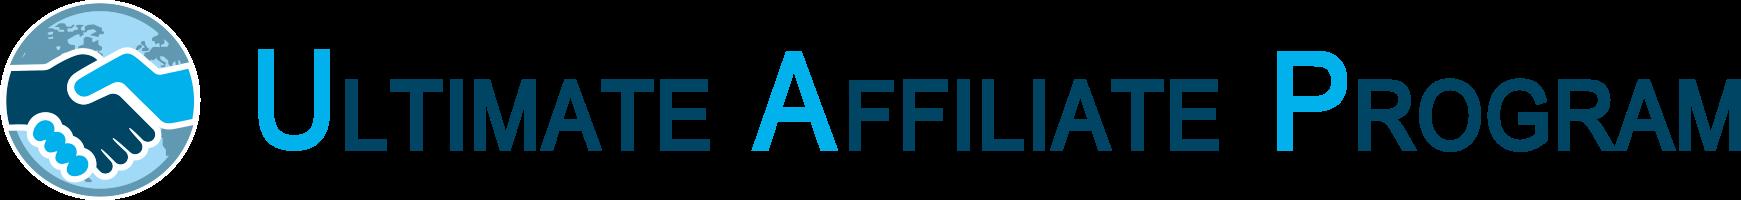 logo_uap_horizontal_ok